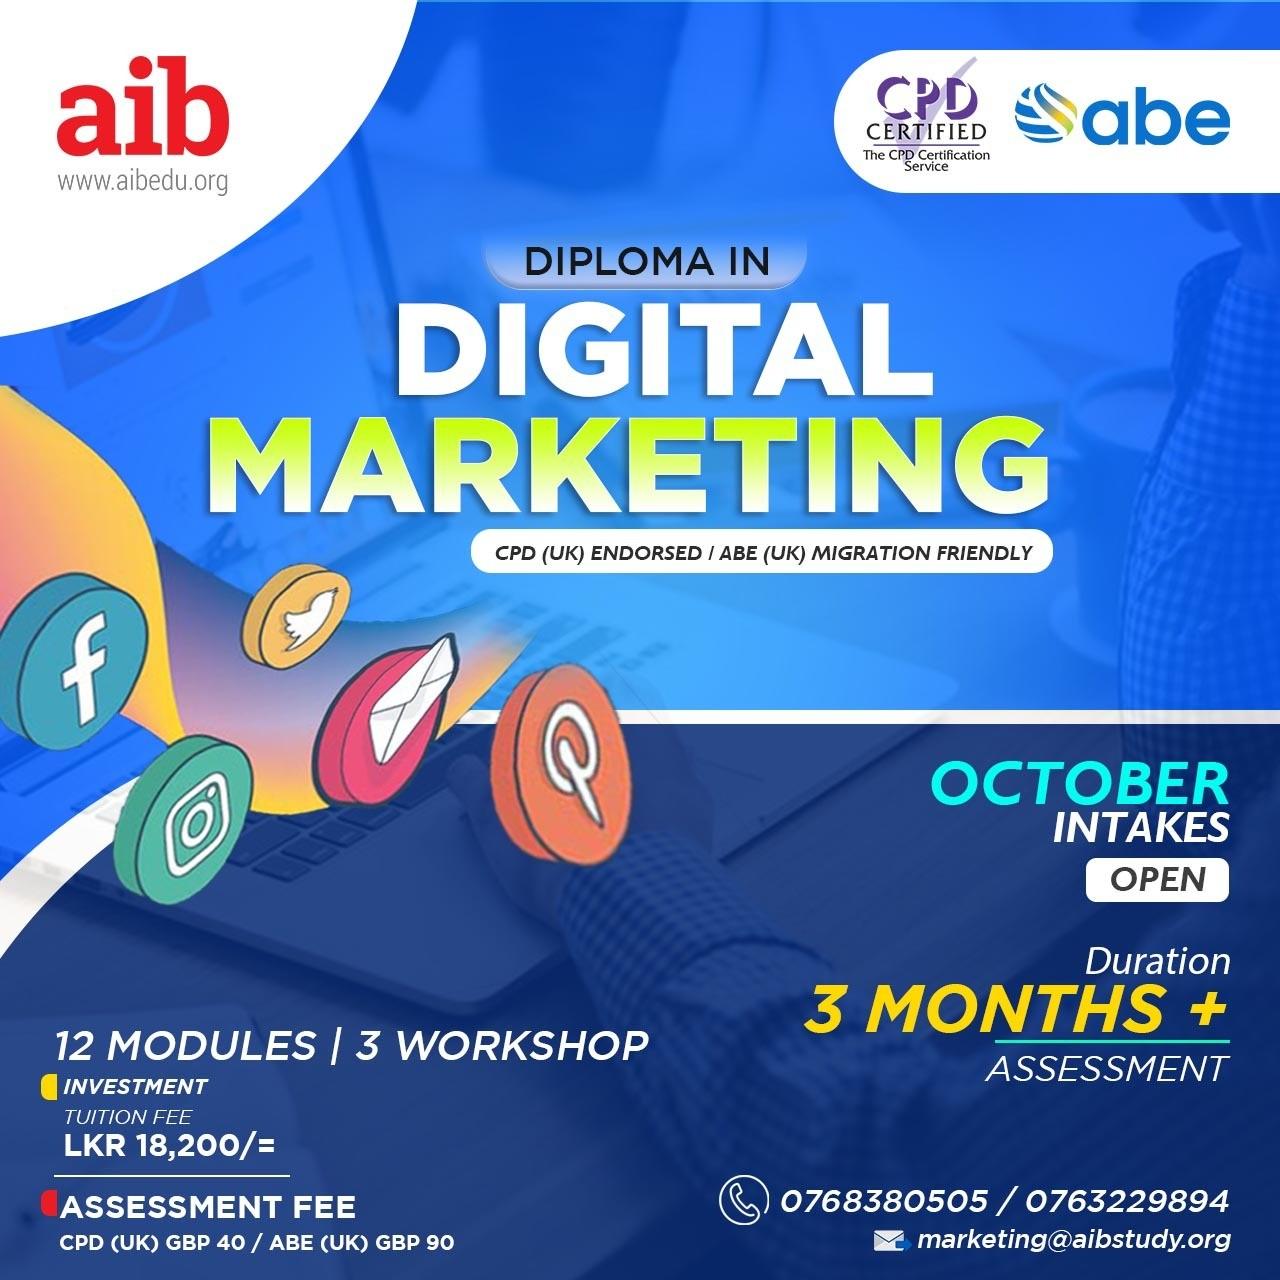 Professional Diploma in Digital Marketing